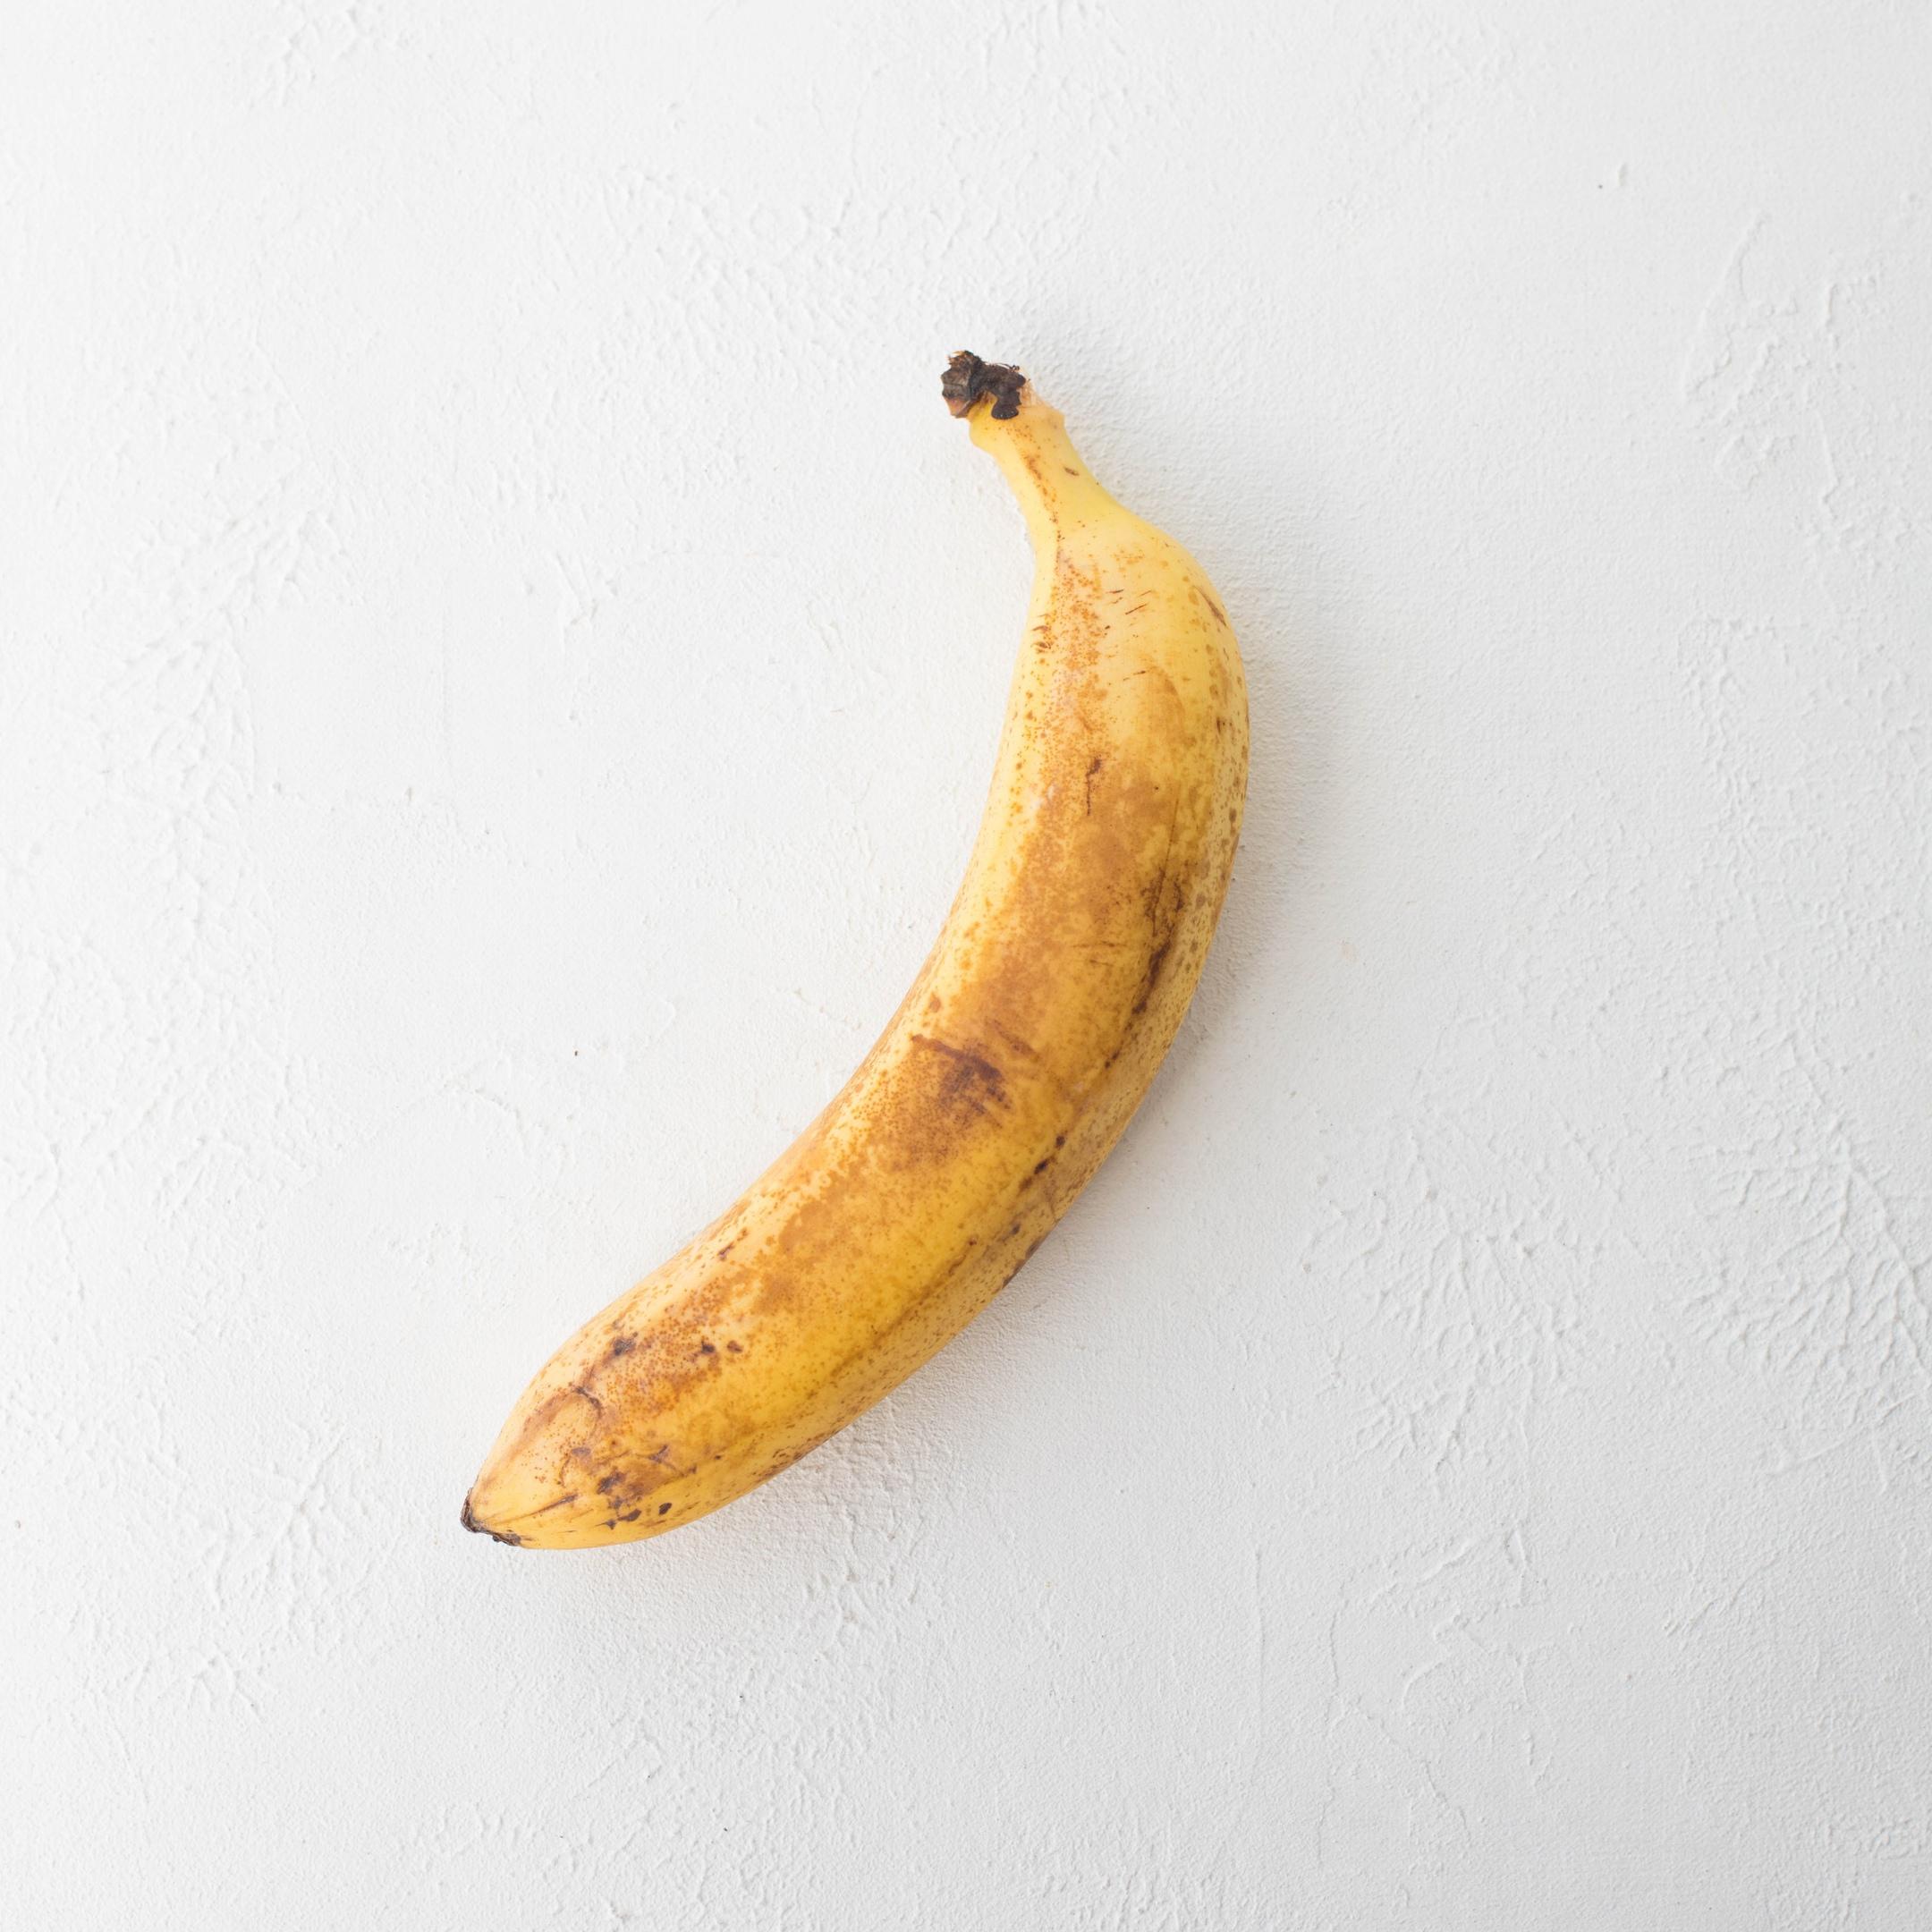 Банан для смузи и выпечки (1 шт.)